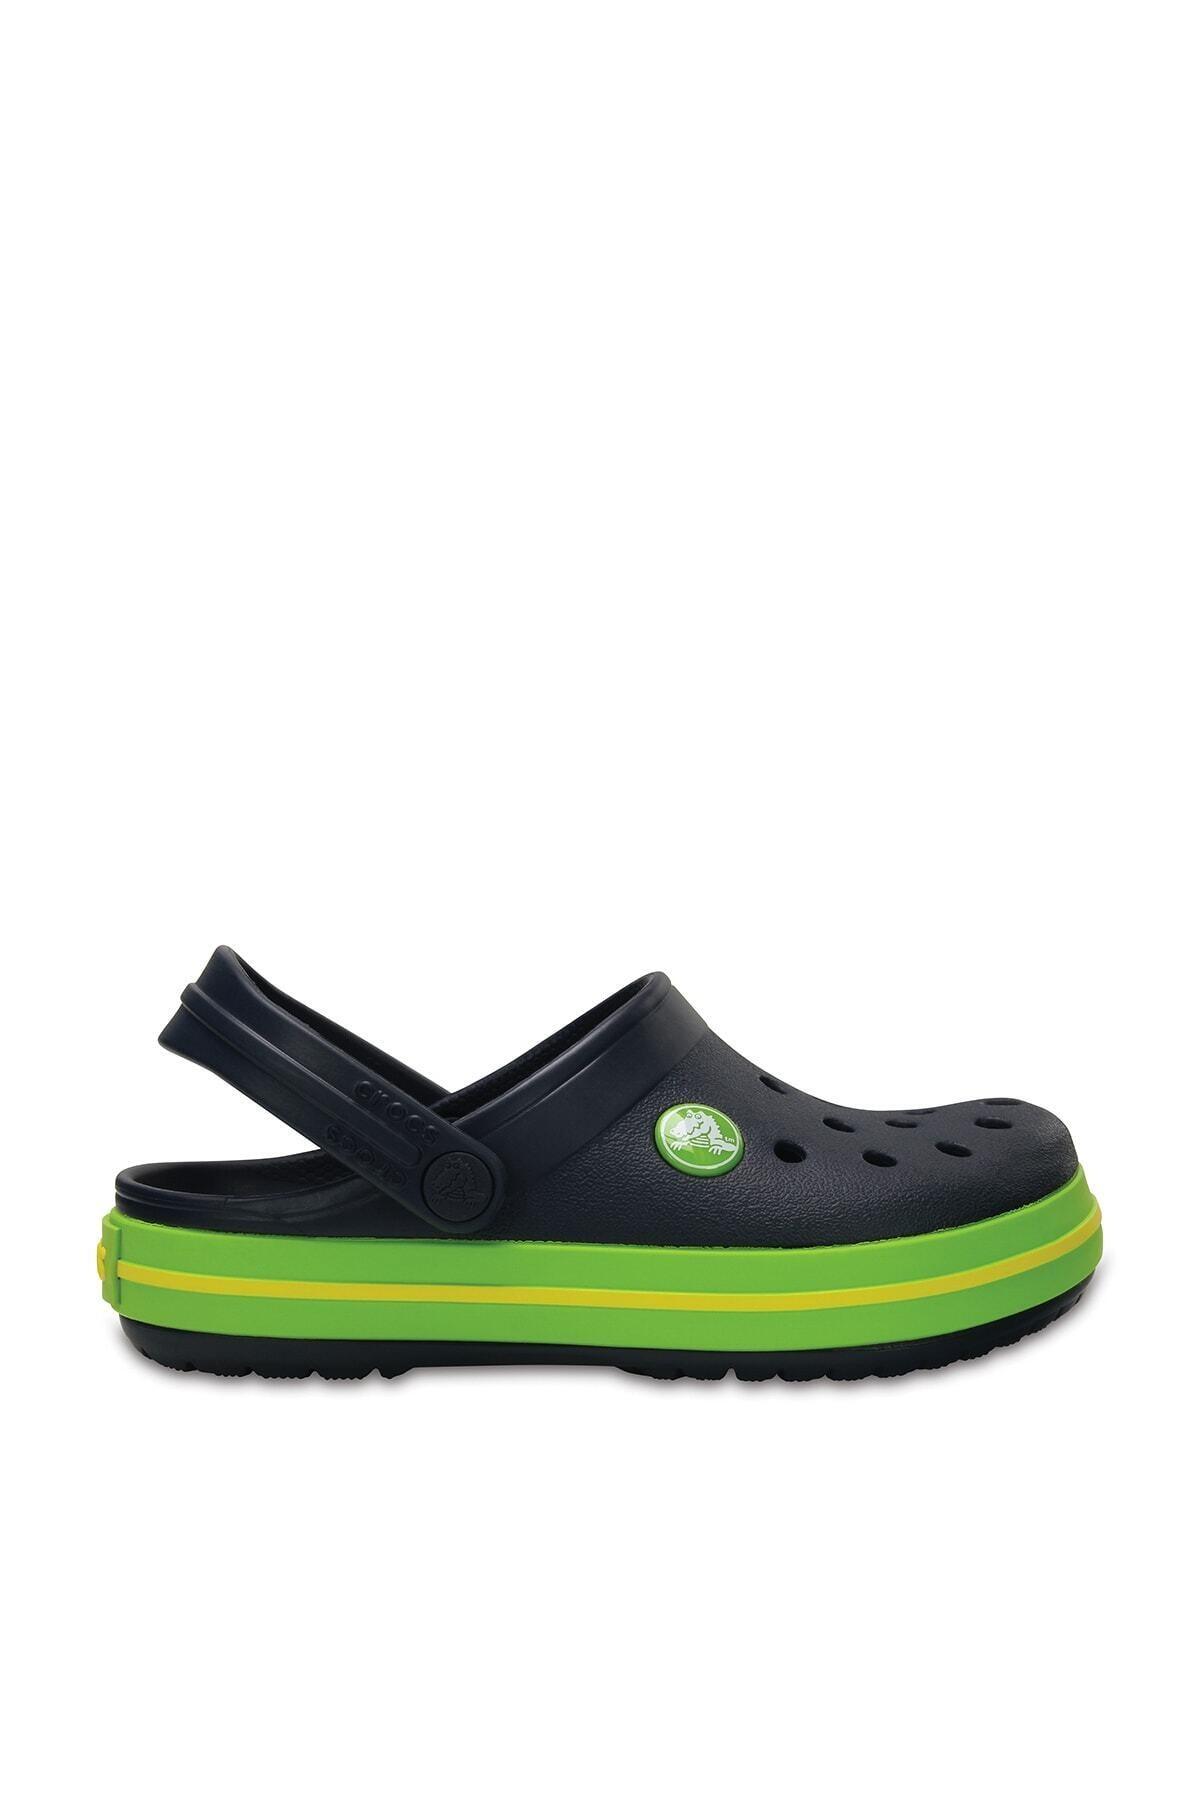 Crocs Kids CROCBAND KIDS Lacivert Unisex Çocuk Terlik 100528610 1